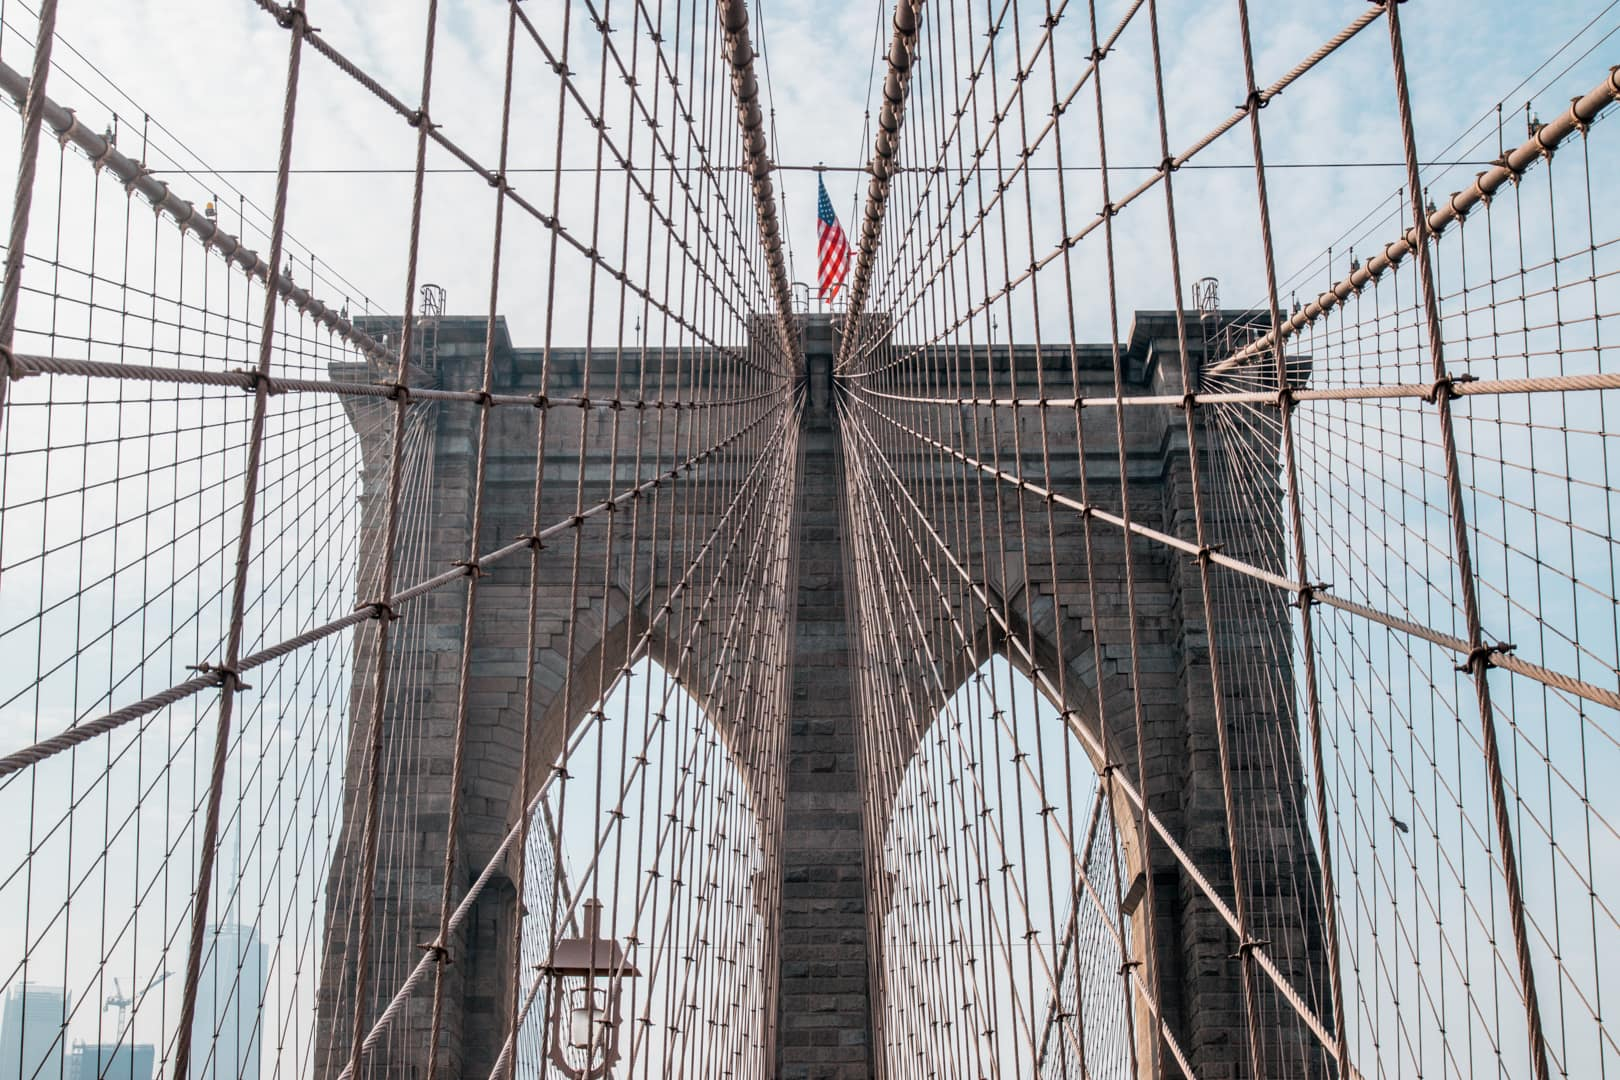 NewYorkBrooklynBridgePartTwo10 - STEDENTRIP NEW YORK